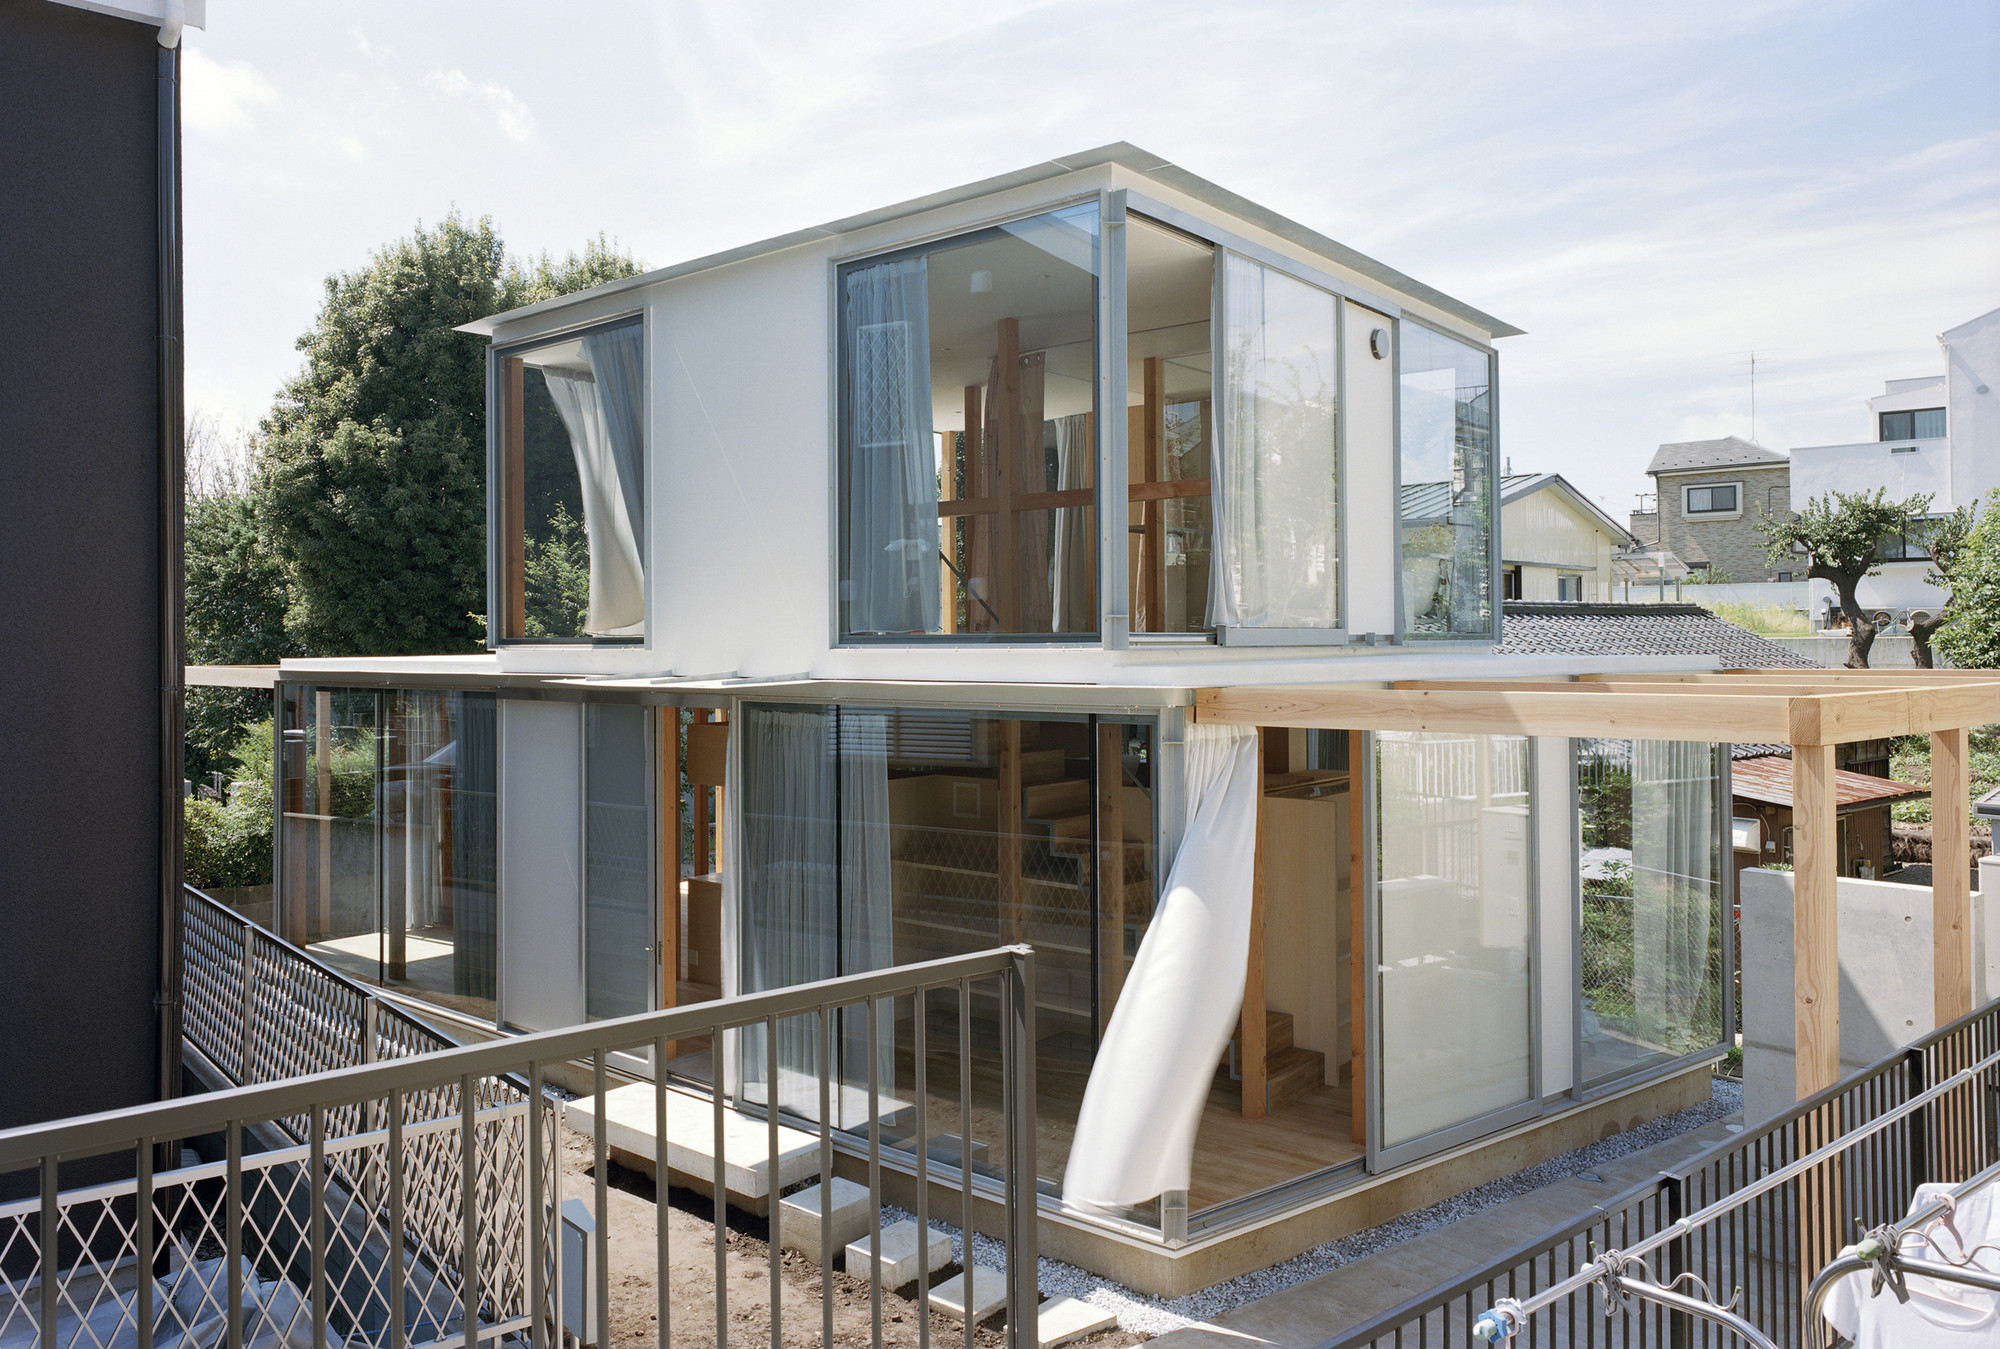 Modern Wood Amp Glass House In Japan Designs Amp Ideas On Dornob